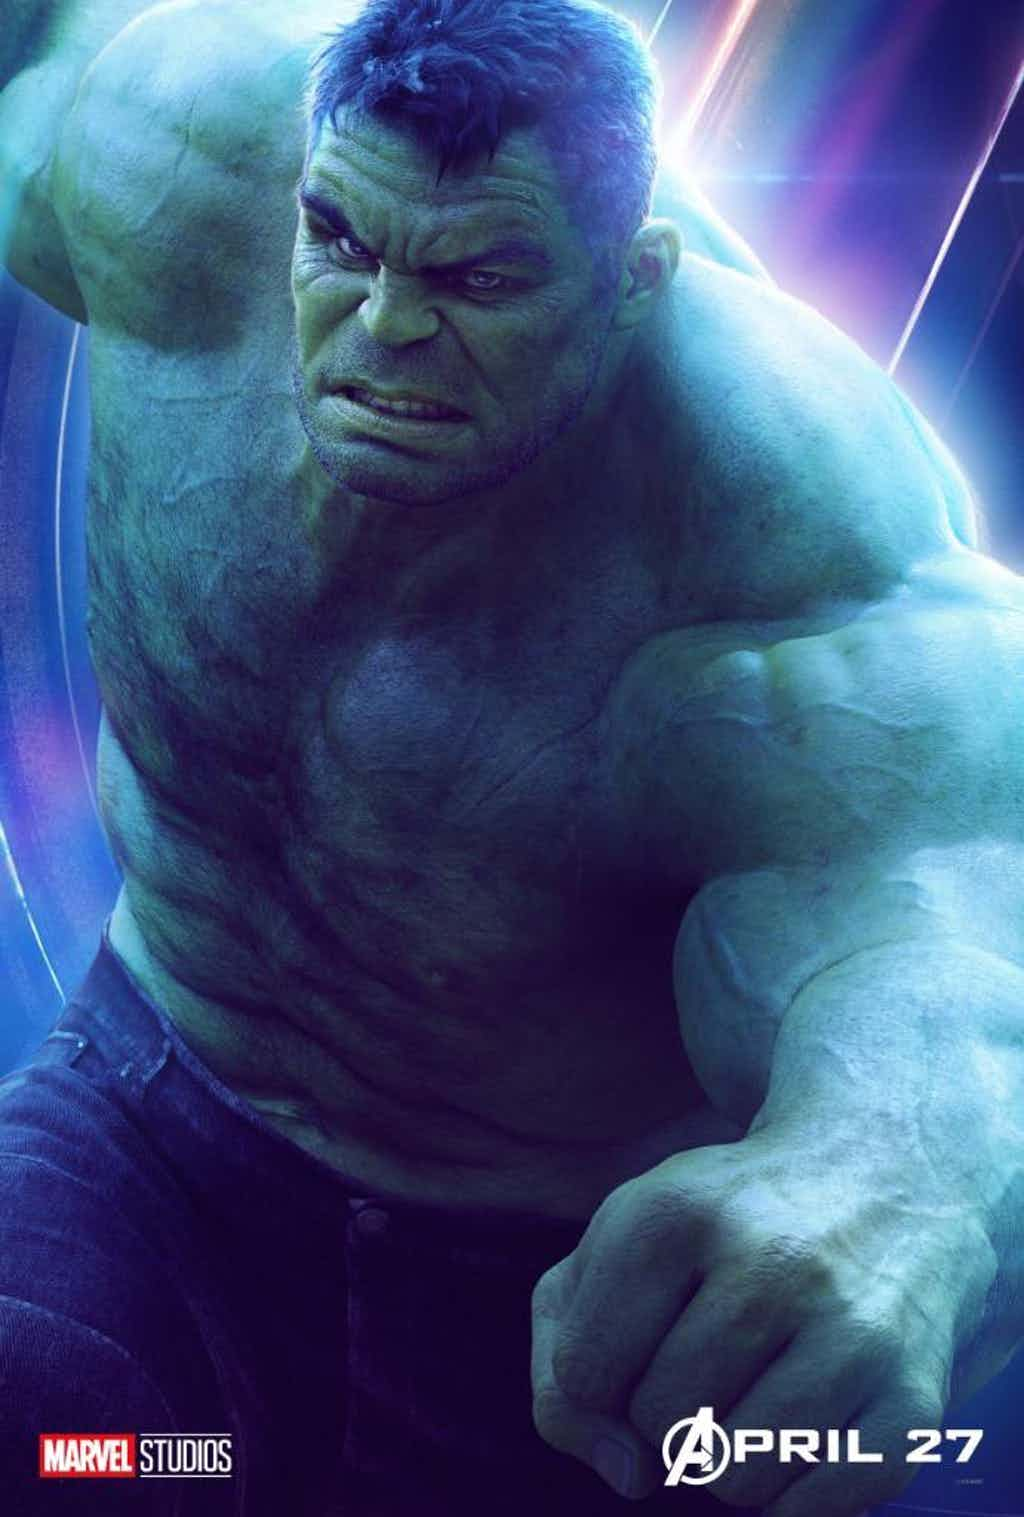 szmk_marvel_infinity_war_vegtelen_haboru_bosszuallok_avengers_ironman_hulk_thor_captainamaerica_guardians_galaxy_7.jpg